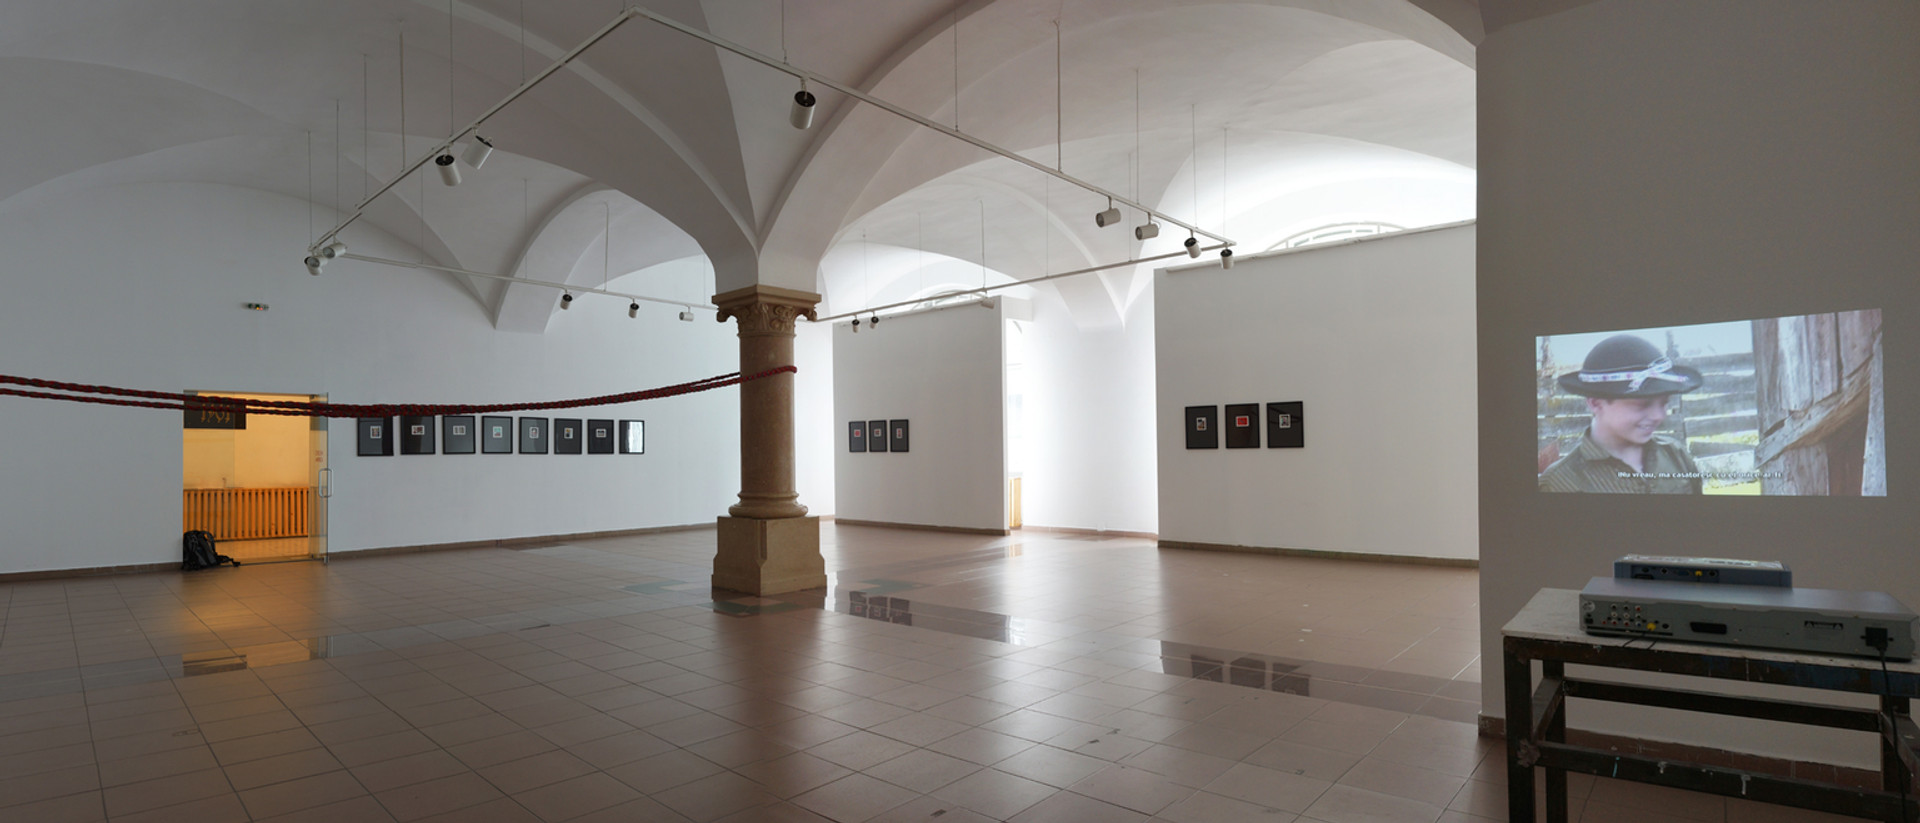 Chelen Amenca/Dance with Us, 2012